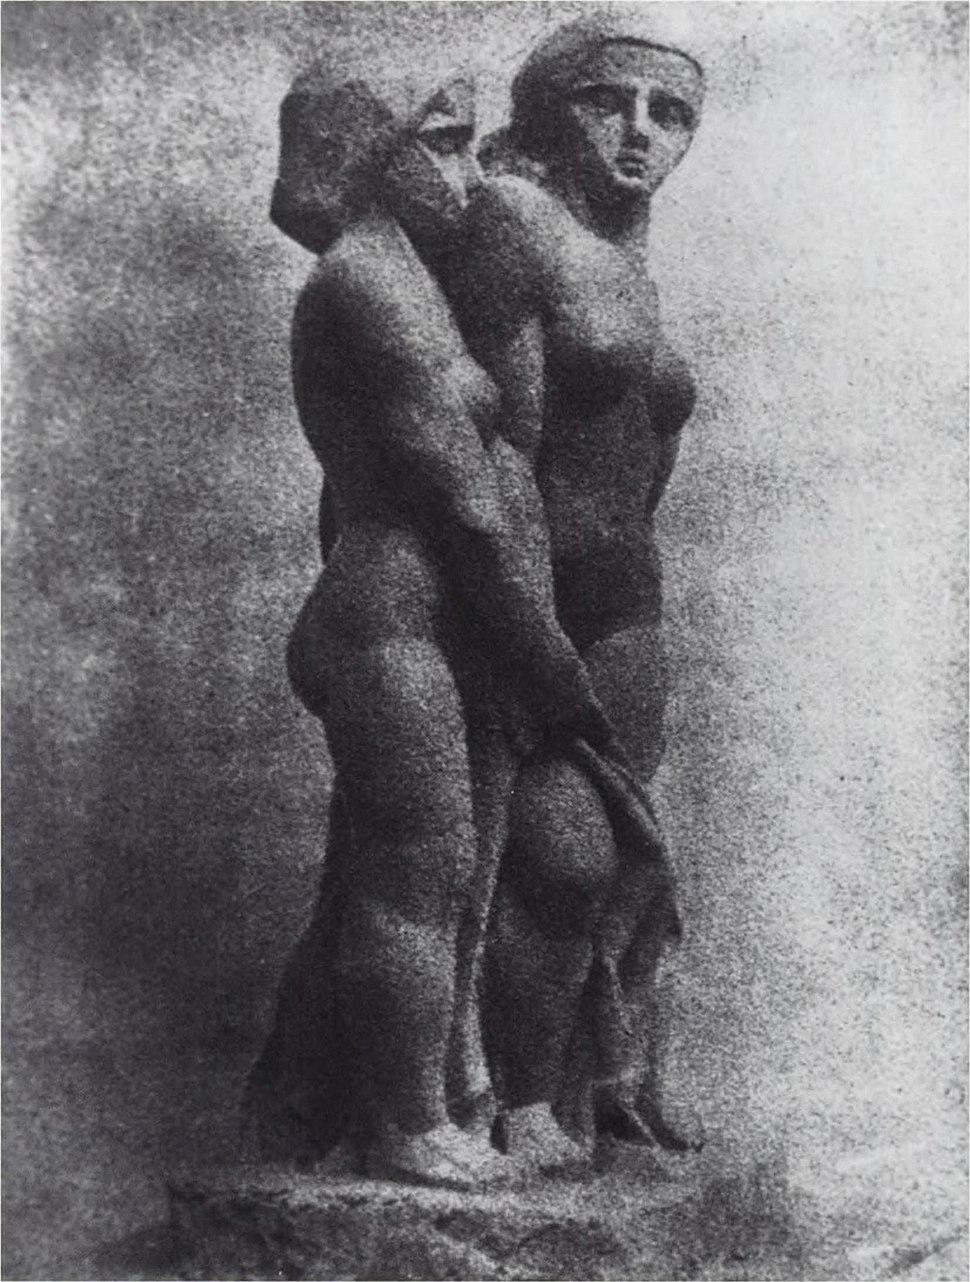 Joseph Csaky, 1911-1912, Deux Femme (Two Women), plaster lost, photo Galerie René Reichard, Frankfurt, 72dpi